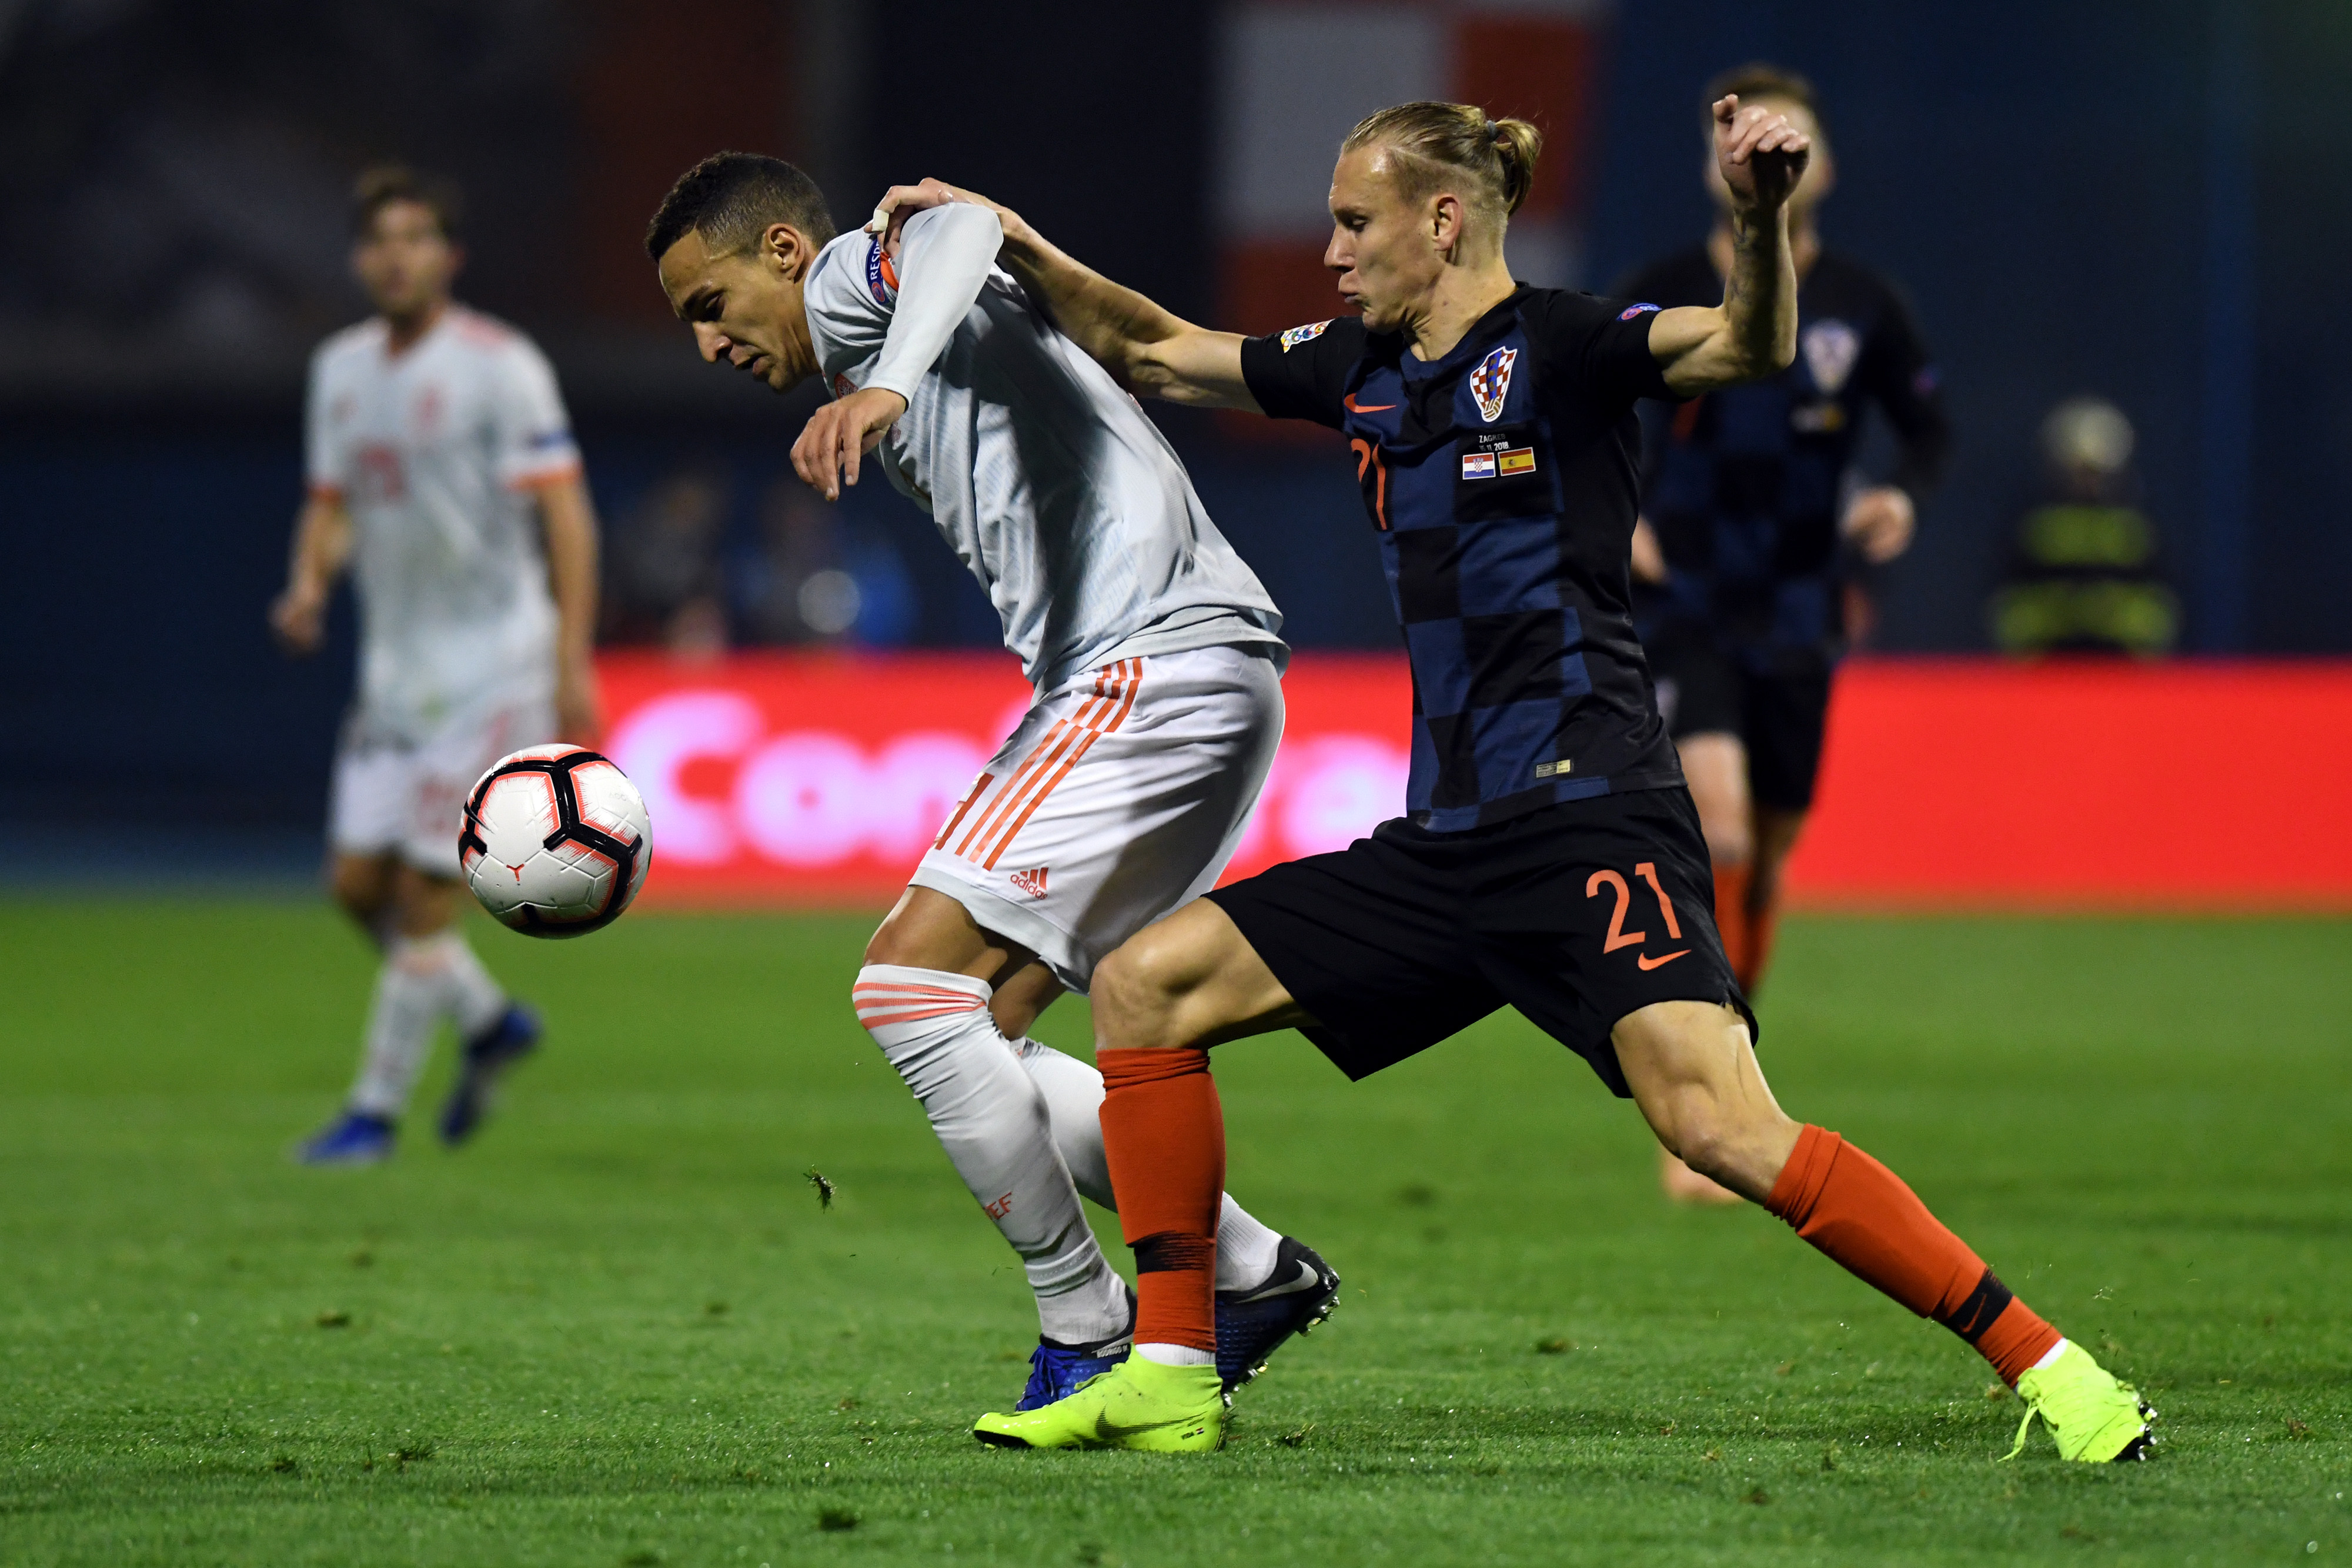 Rodrigo Vida Croatia Spain UEFA Nations League